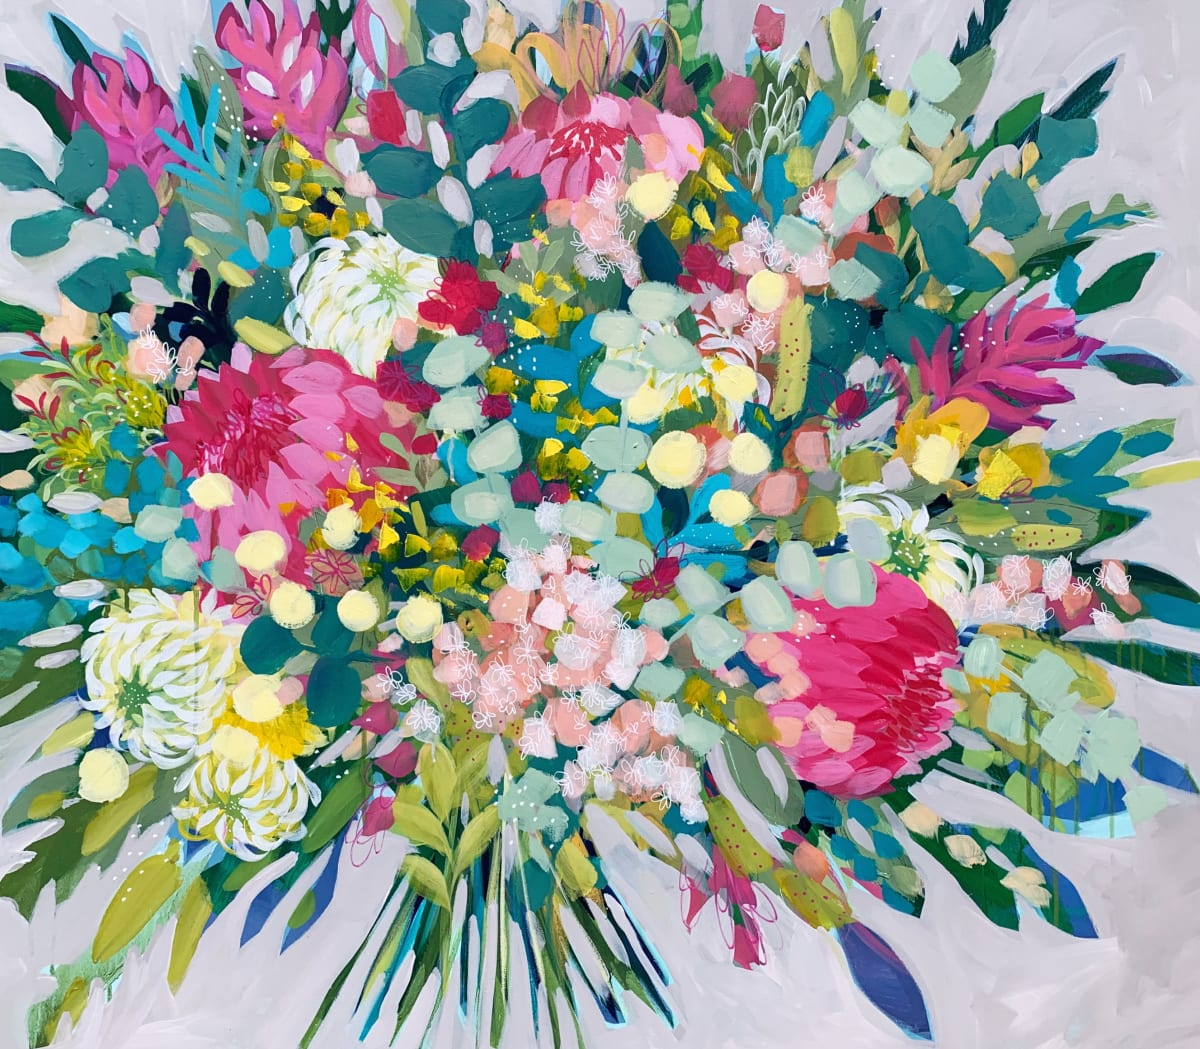 Flower Confetti by Clair Bremner